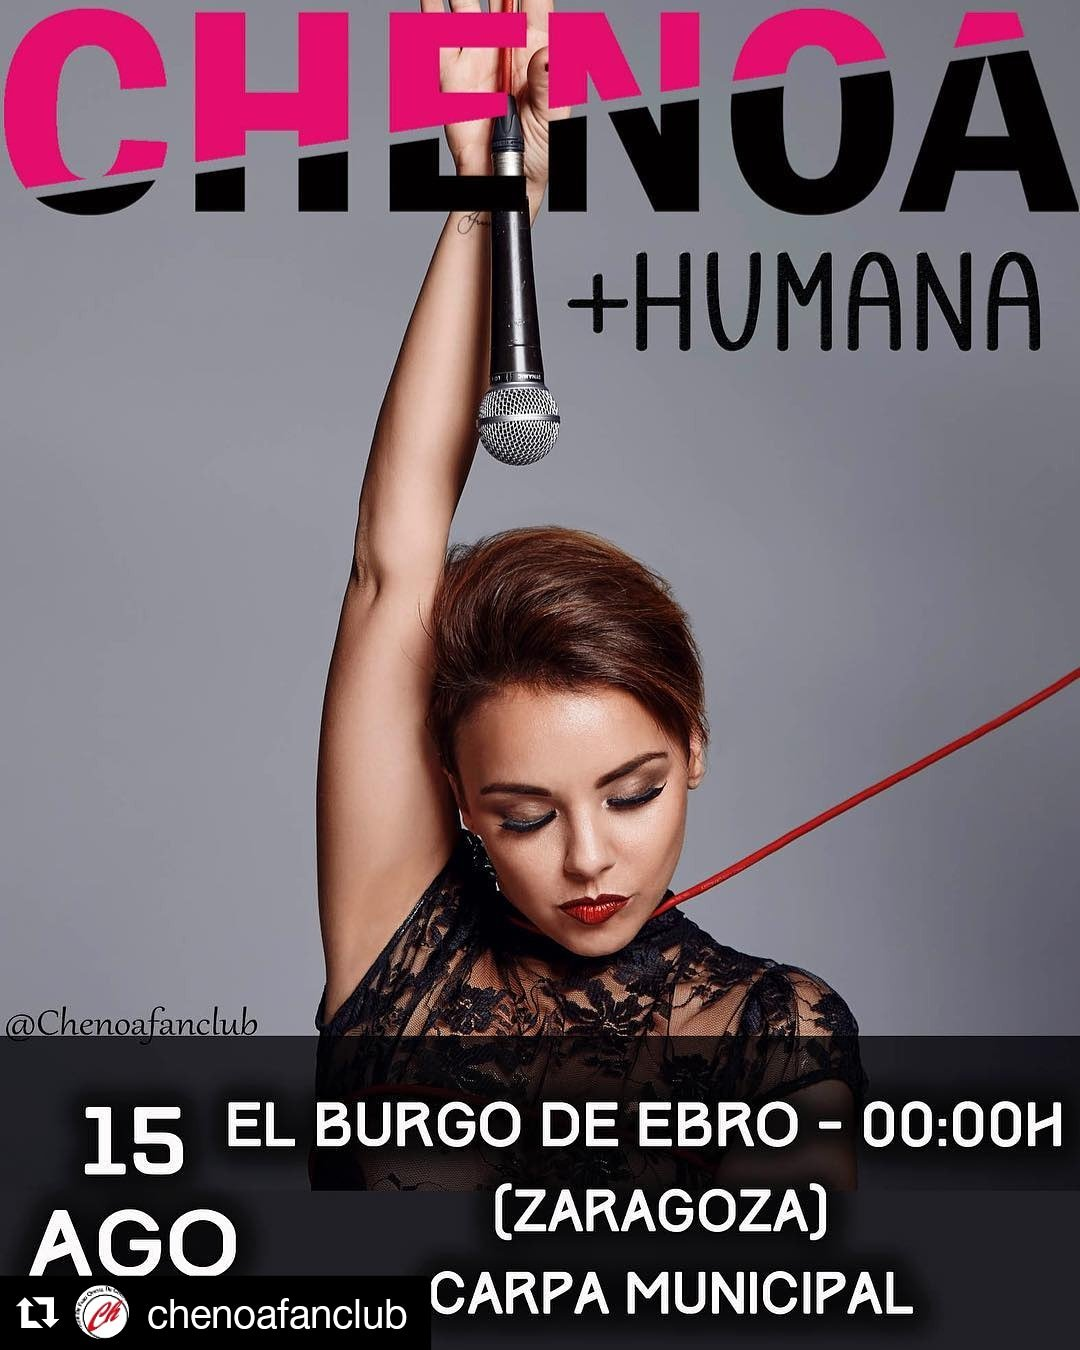 Chenoa en El Burgo de Ebro, Zaragoza, concierto, Zaragoza